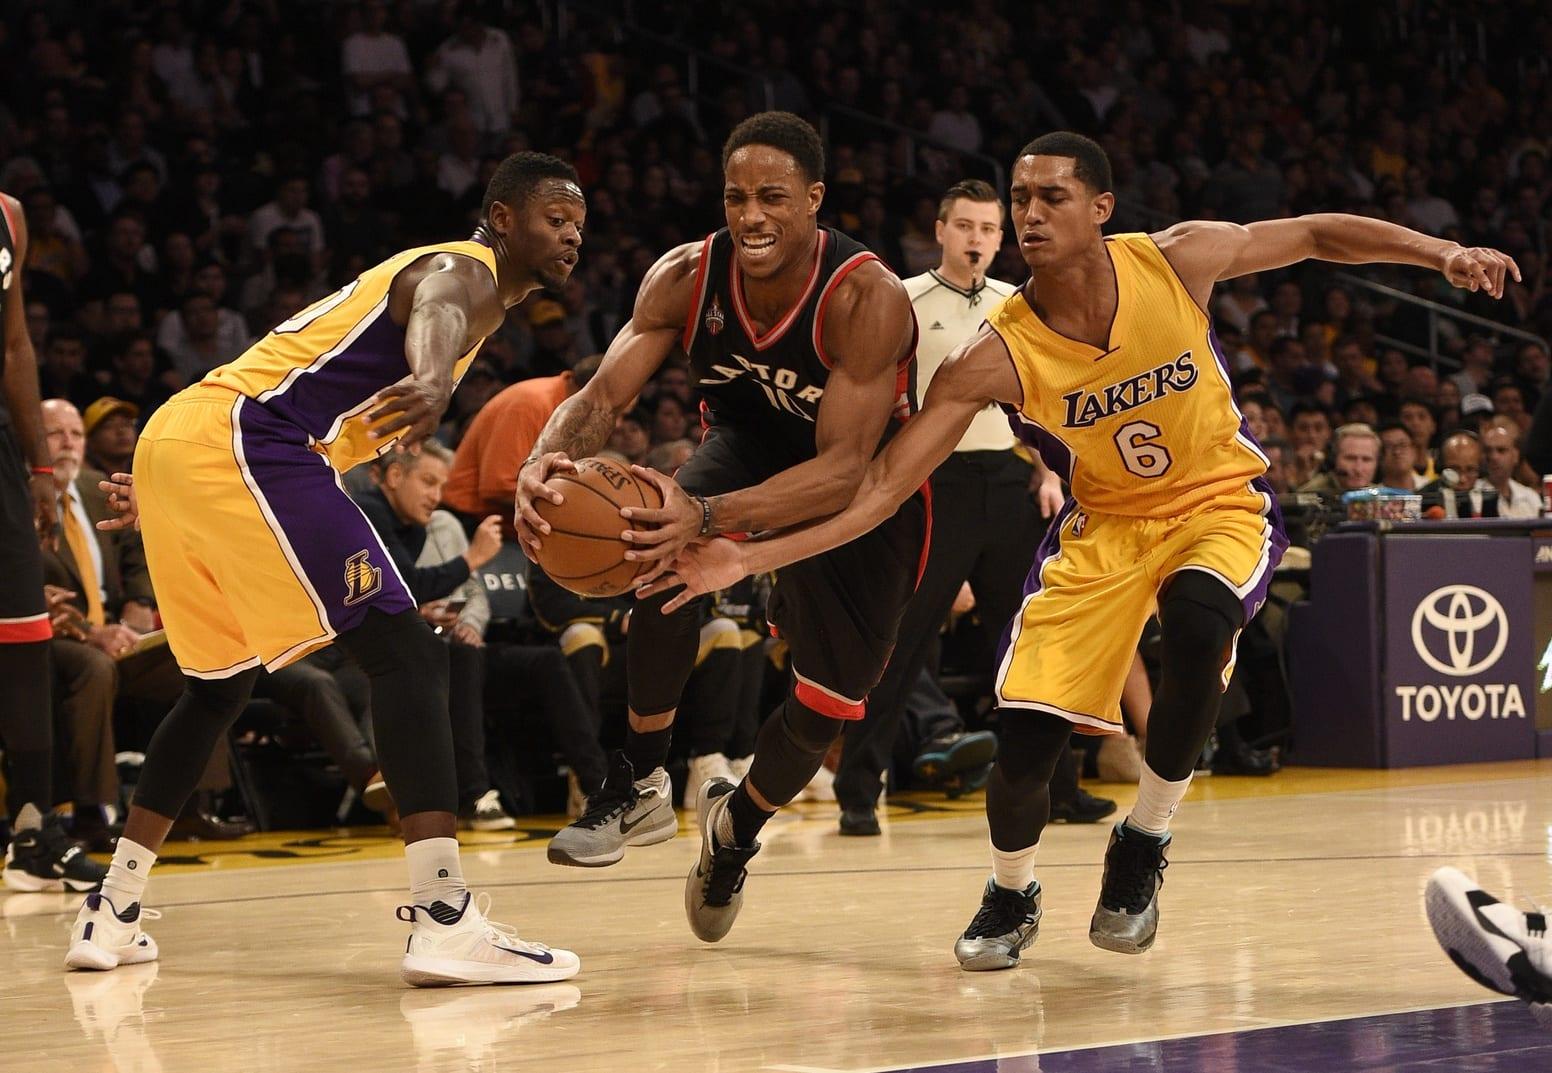 Los Angeles Lakers Vs Toronto Raptors NBA Highlights